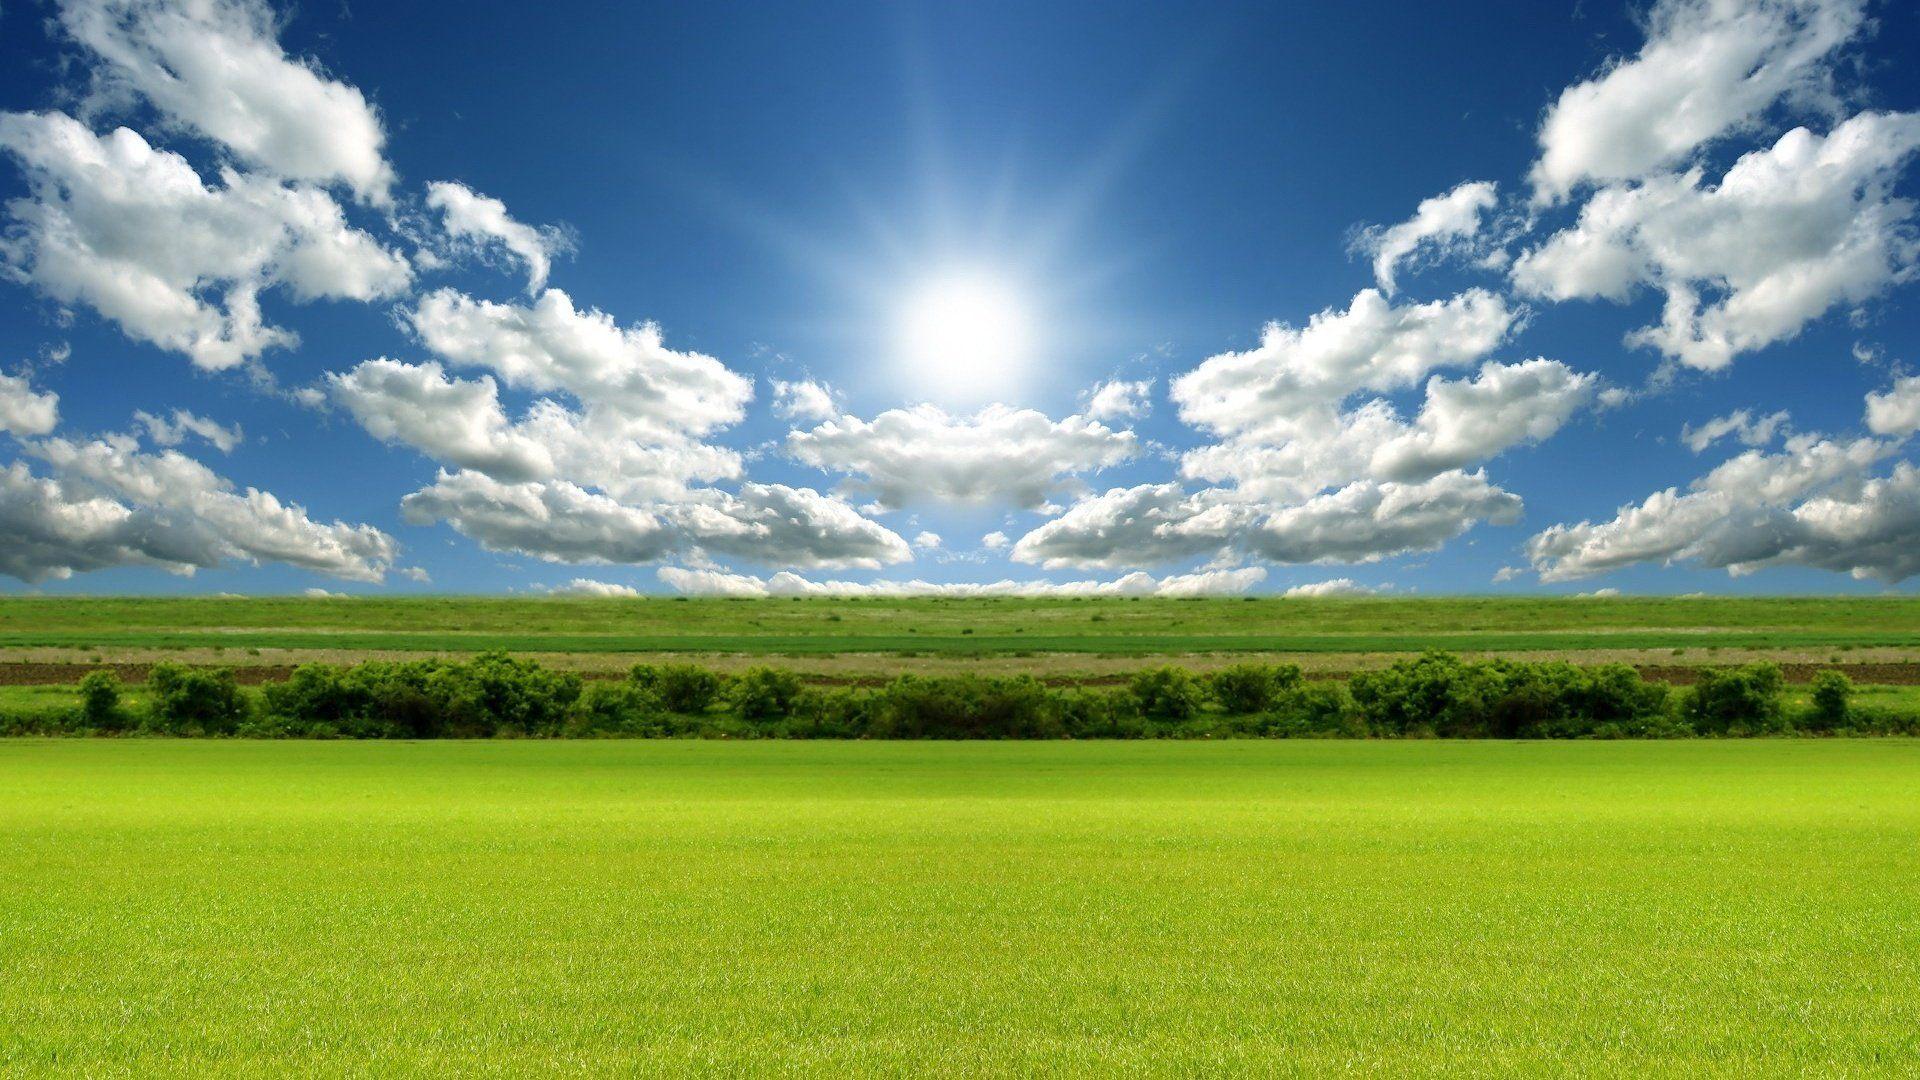 Meadow free download wallpaper